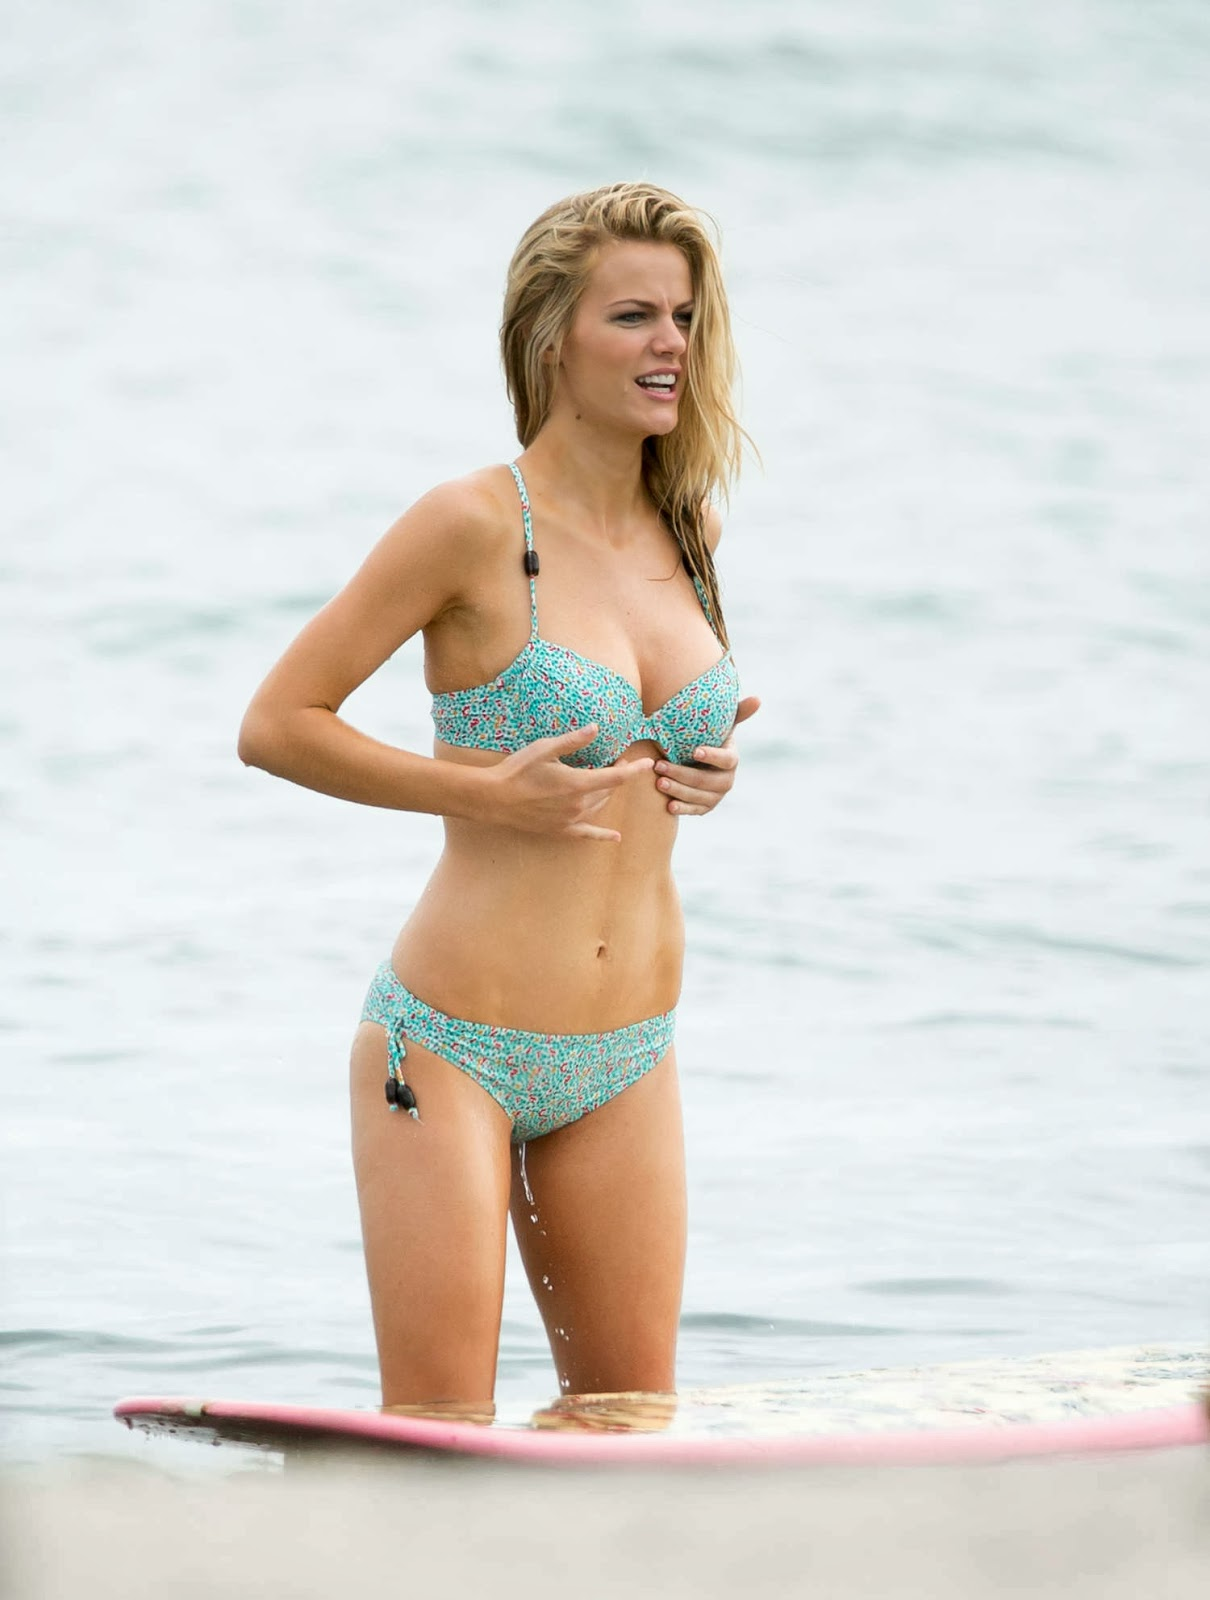 Brooklyn Decker Shows Off Bikini Body For Swimwear Shoot